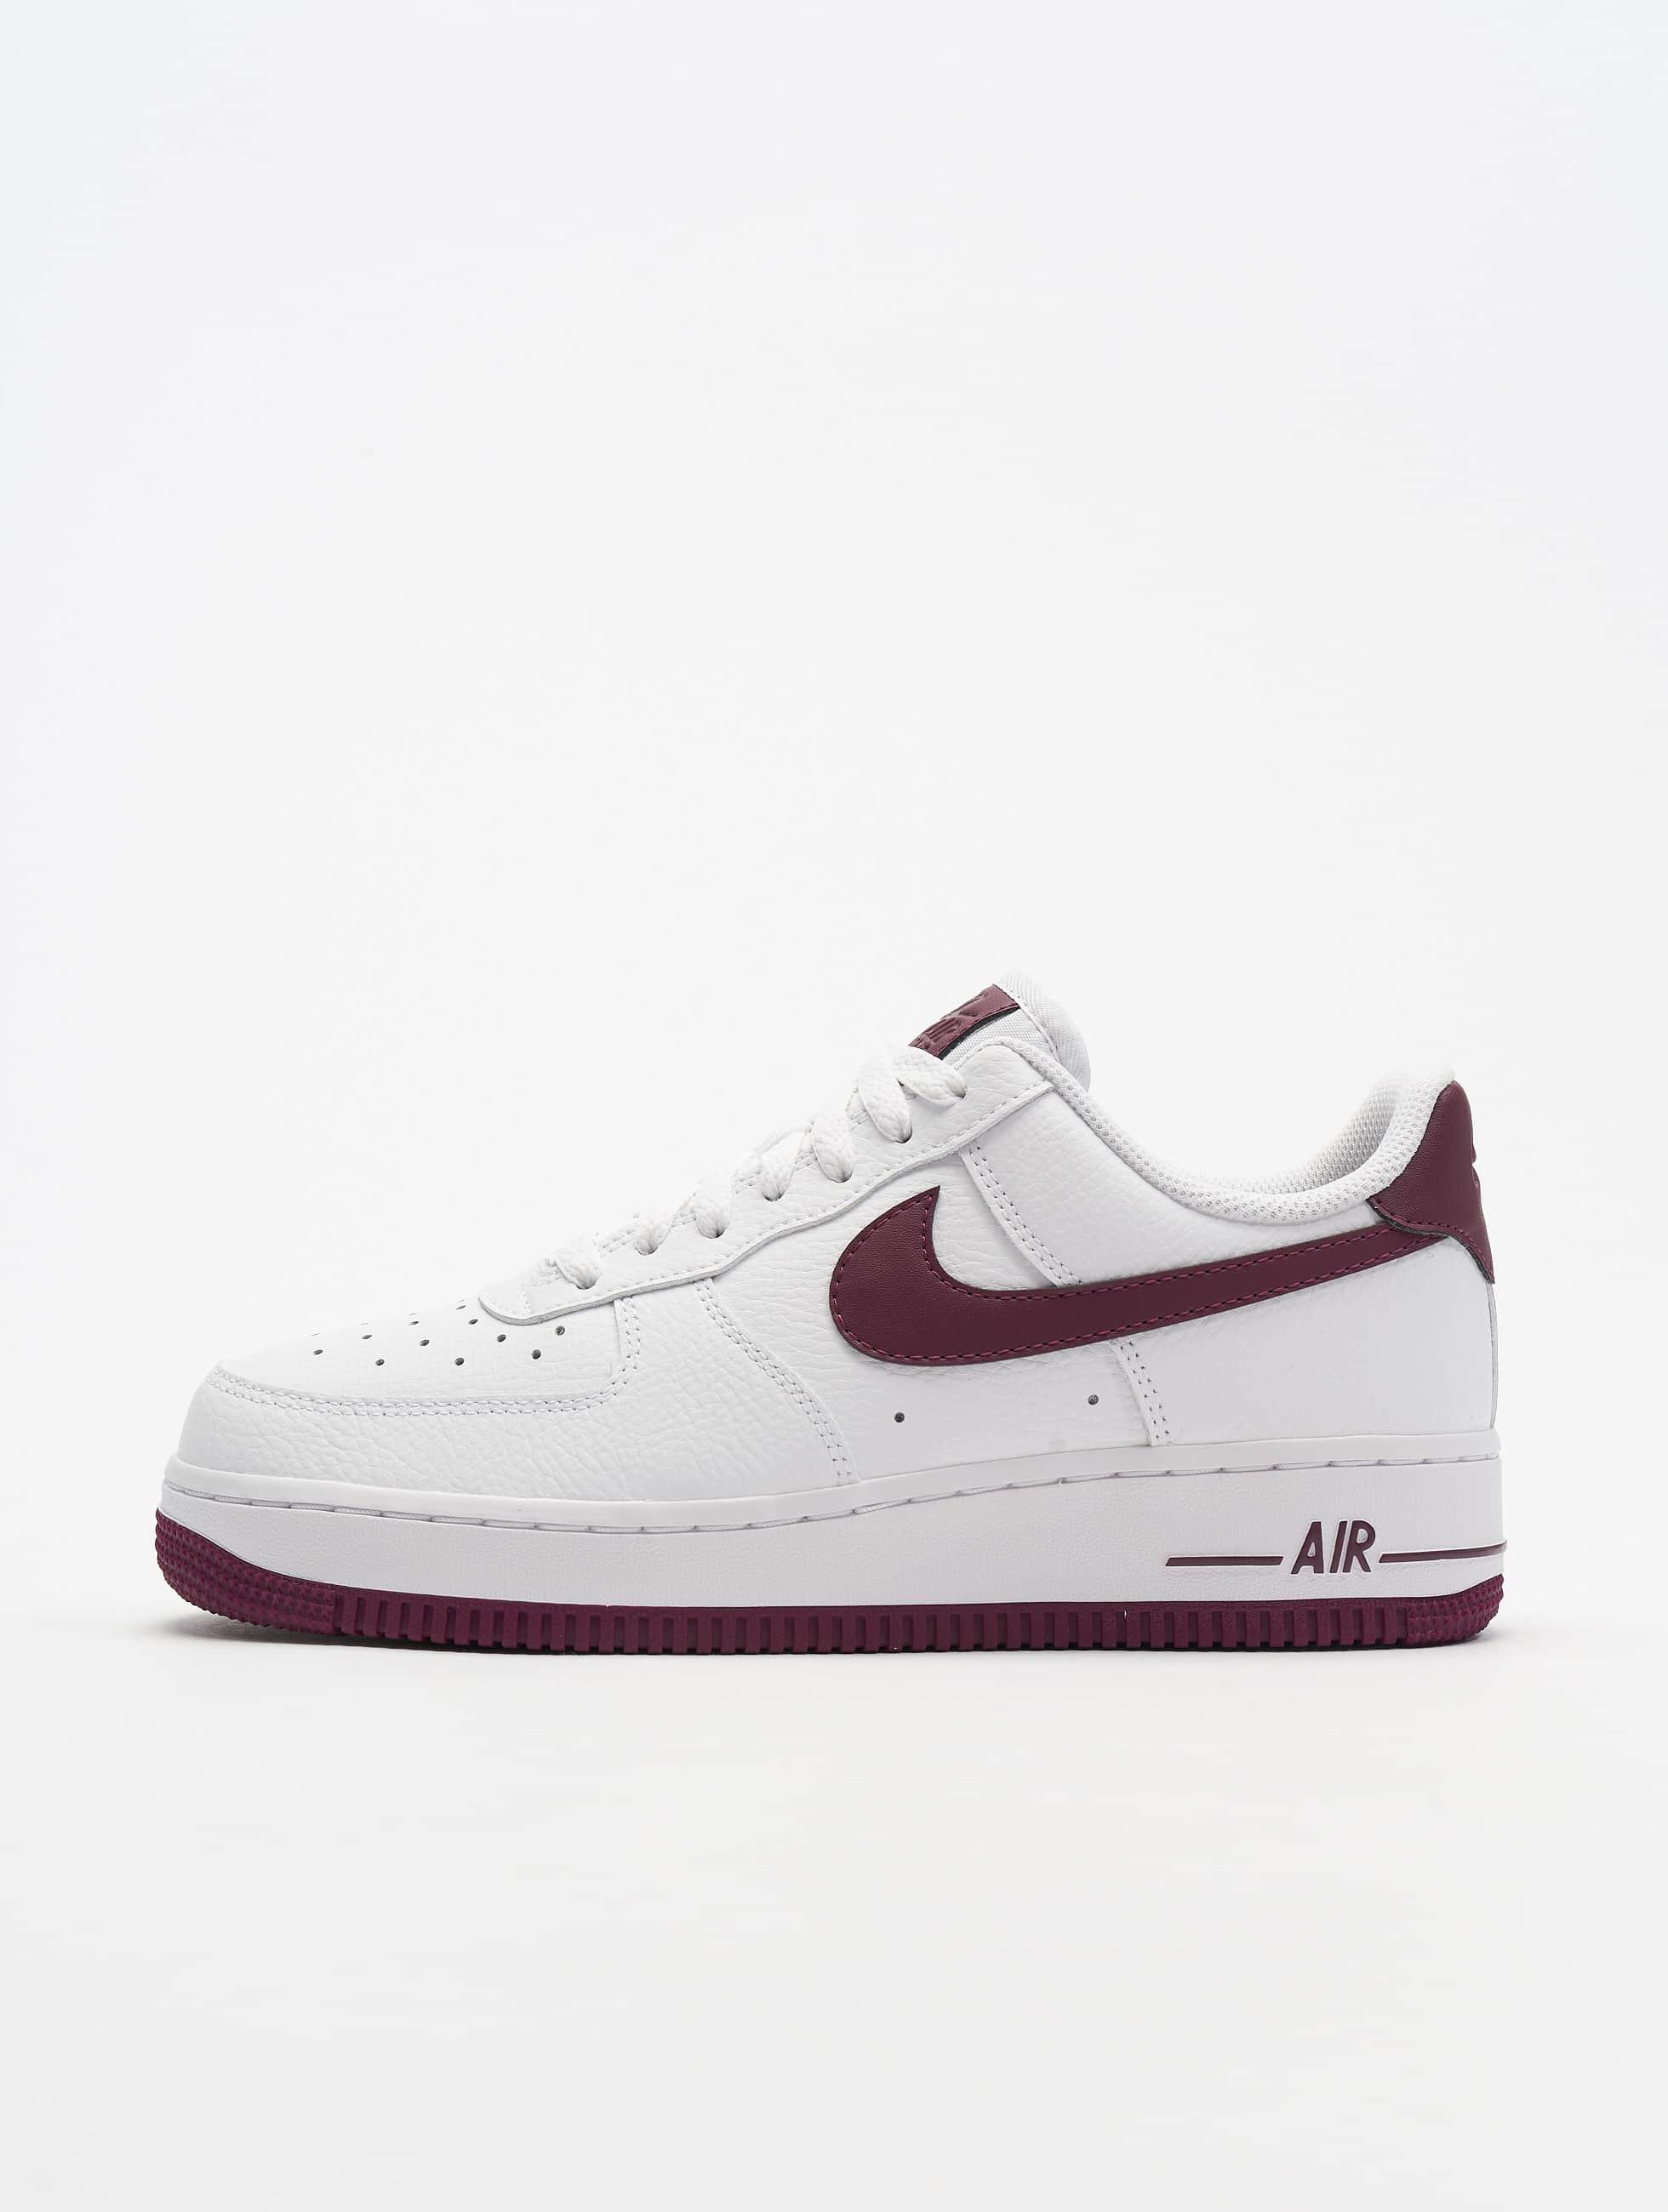 Air Whitebordeaux 1 07 Nike Sneakers Force rdxeQCBWo